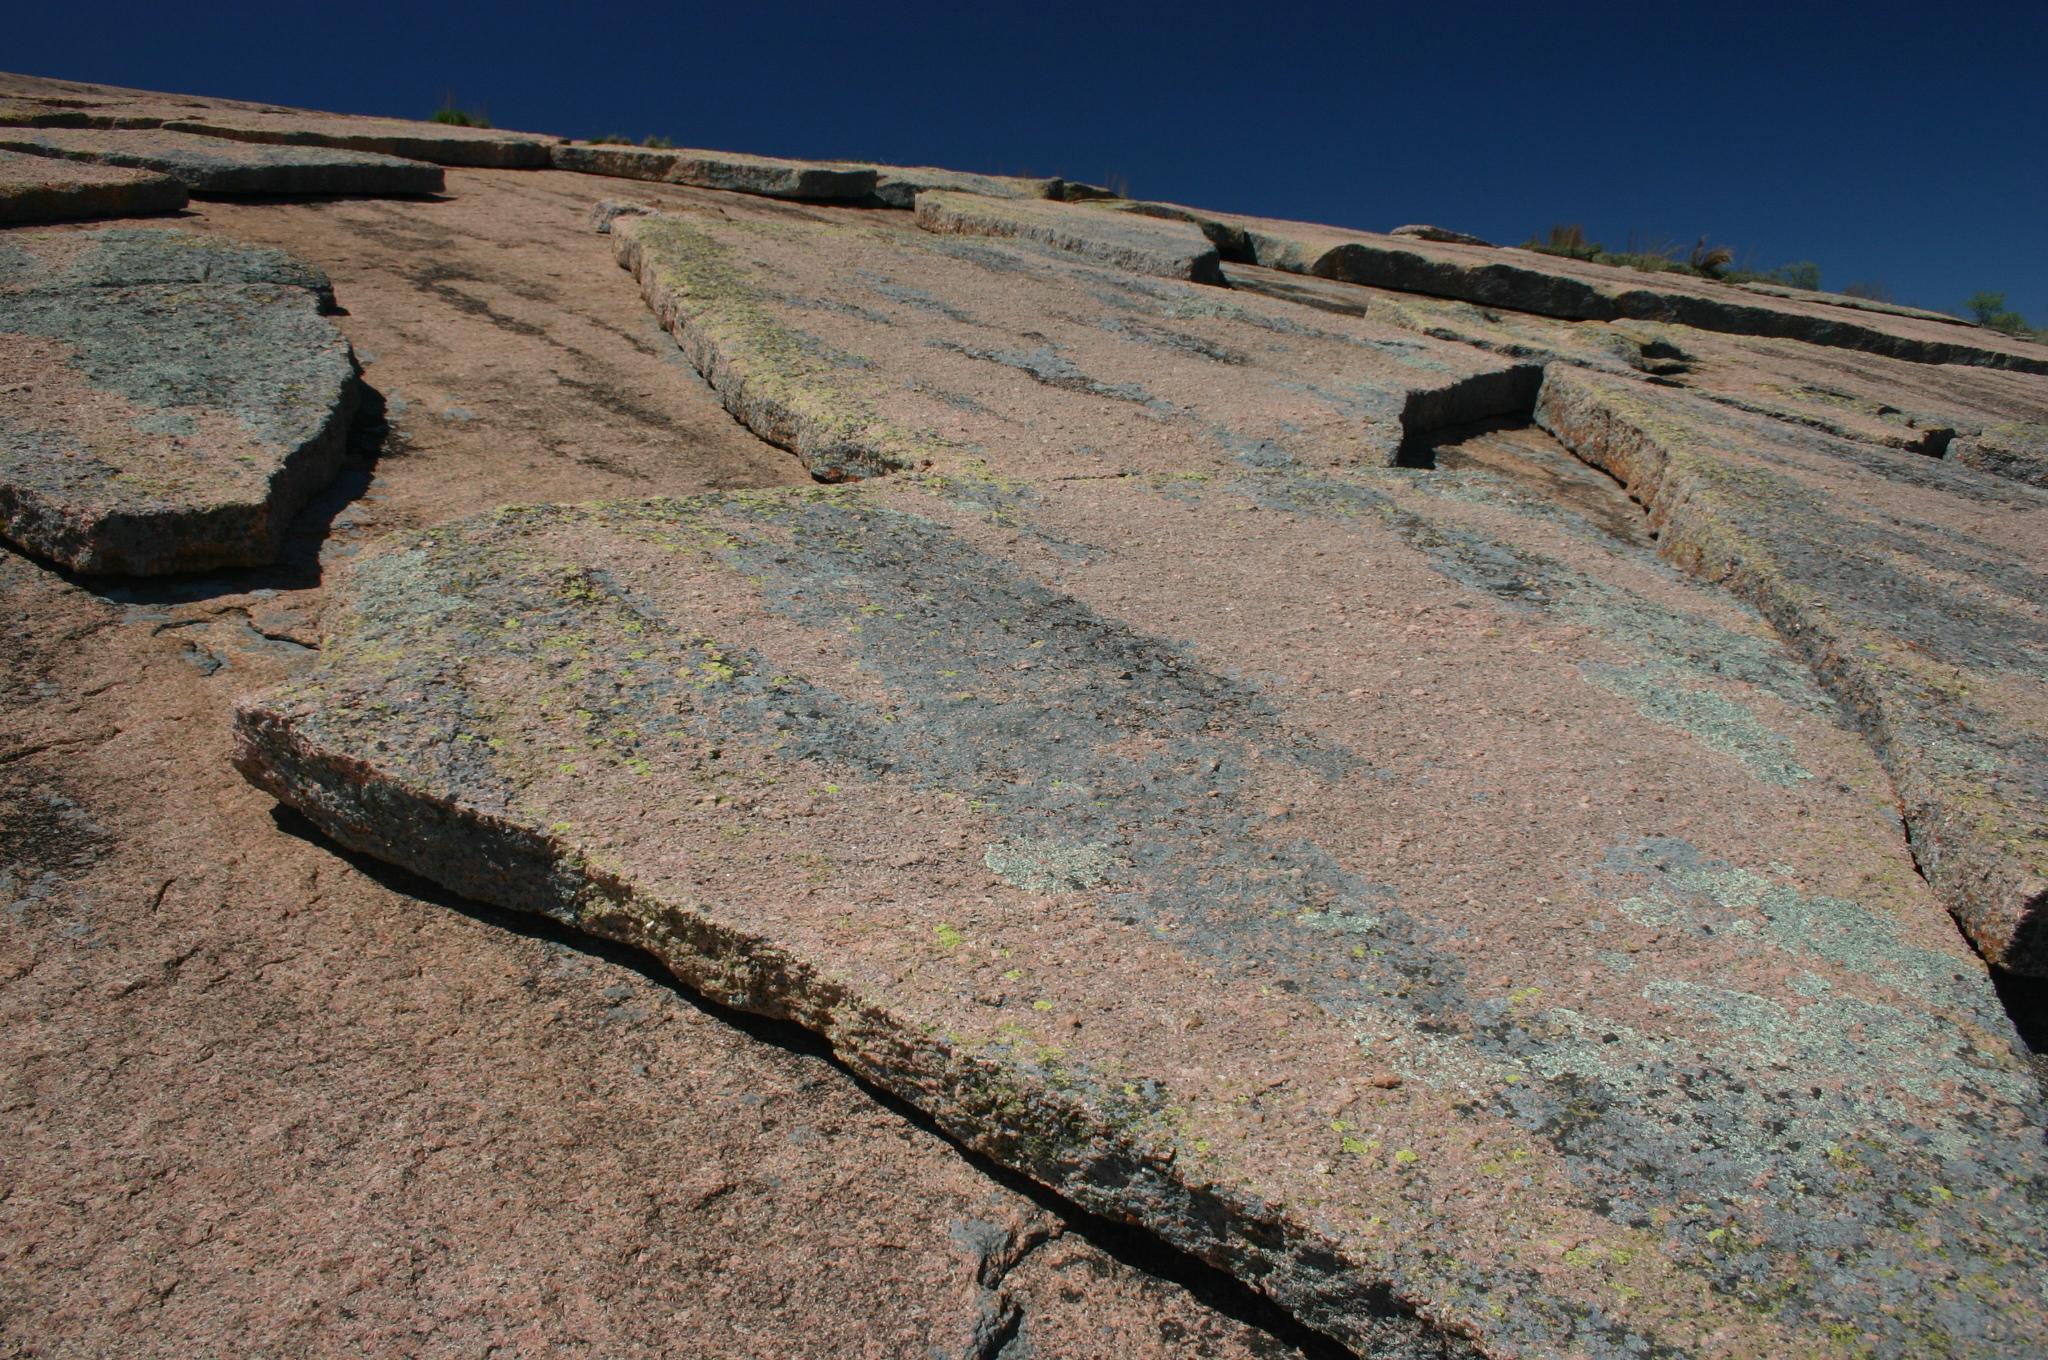 GeologicalExfoliationOfGraniteRock.jpg